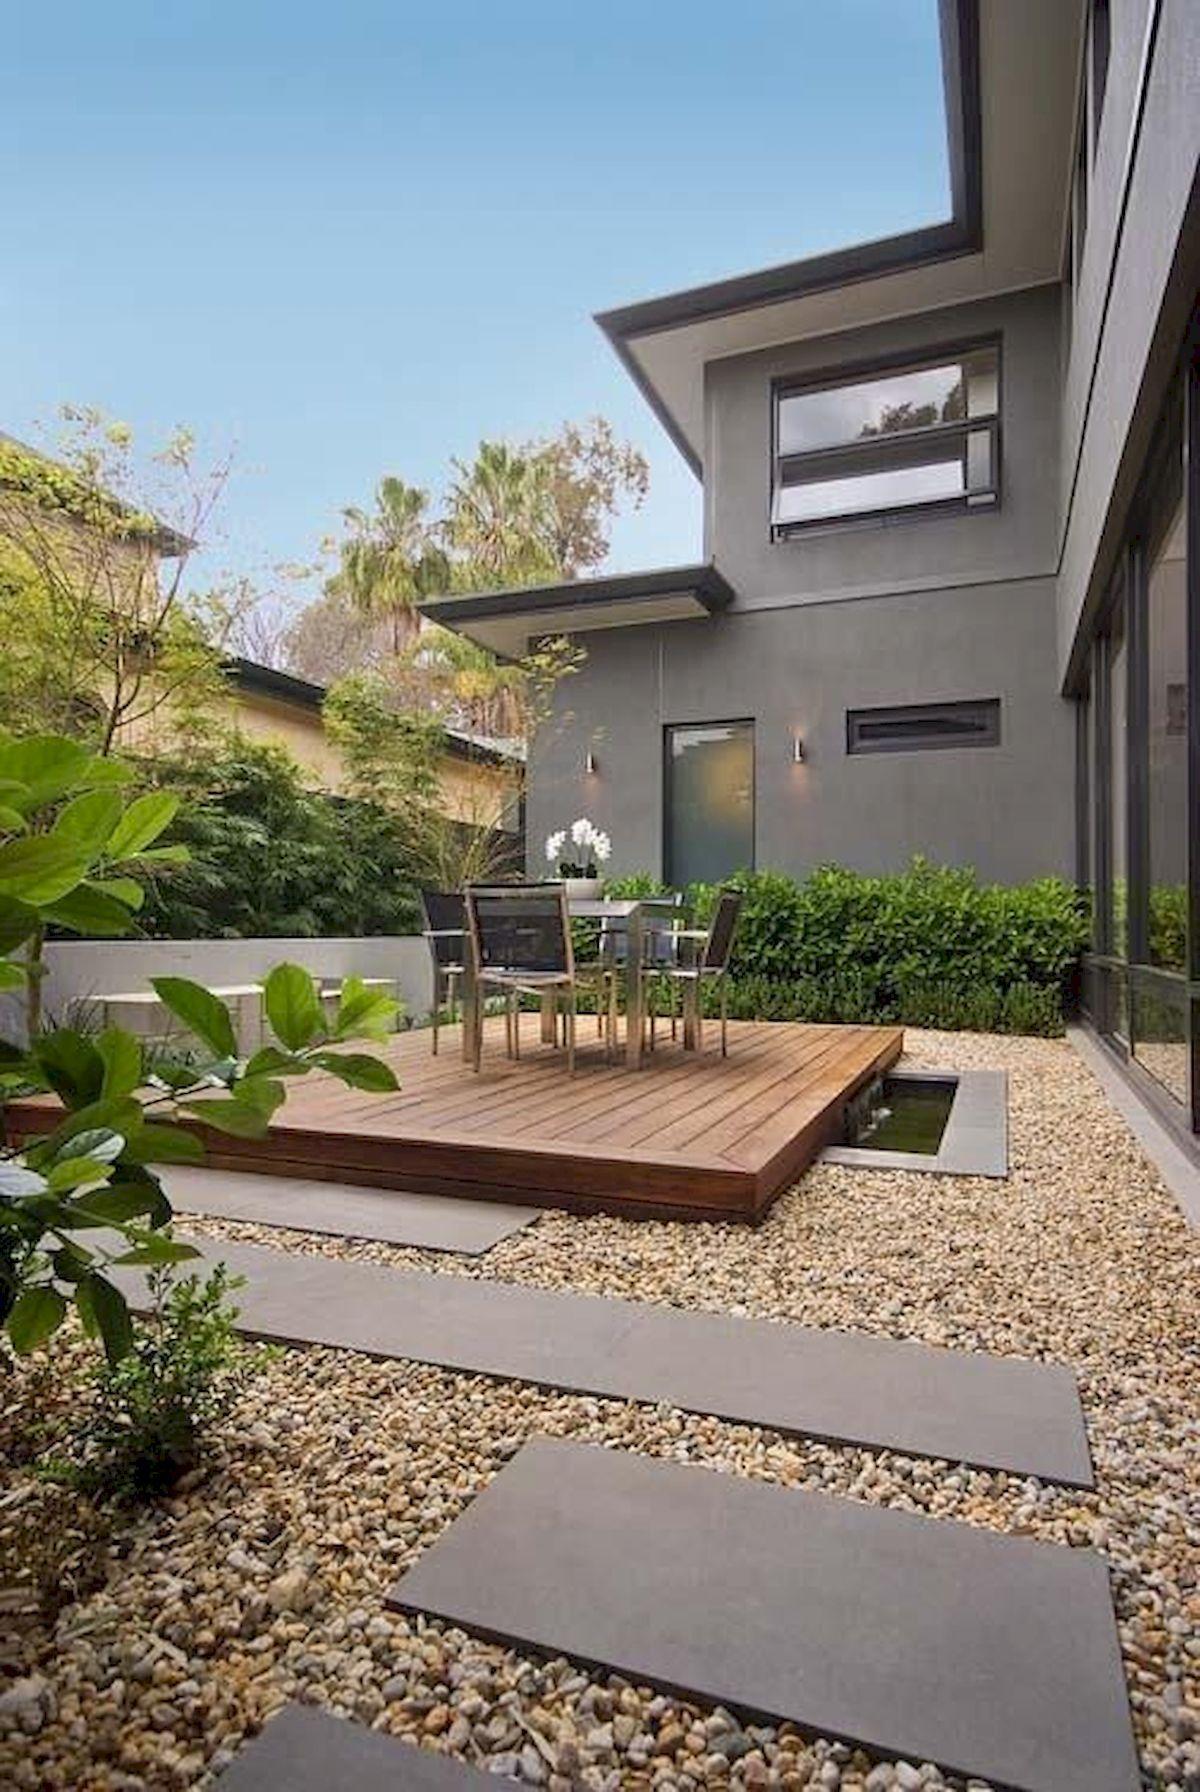 52 Most Creative Cheap Backyard Patio Ideas on A Budget ...